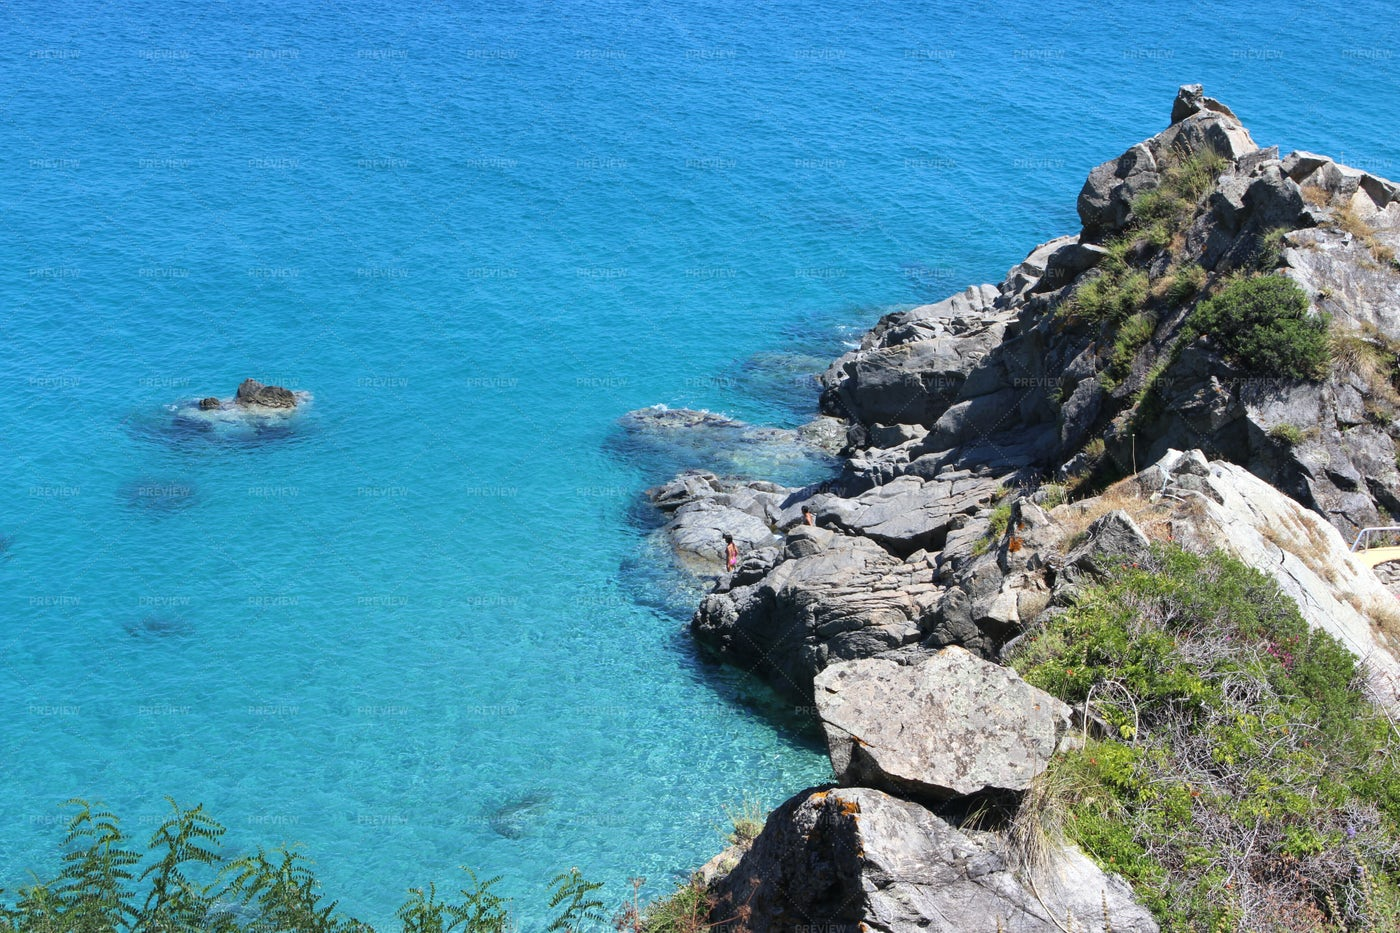 Blue Sea And Rocks: Stock Photos